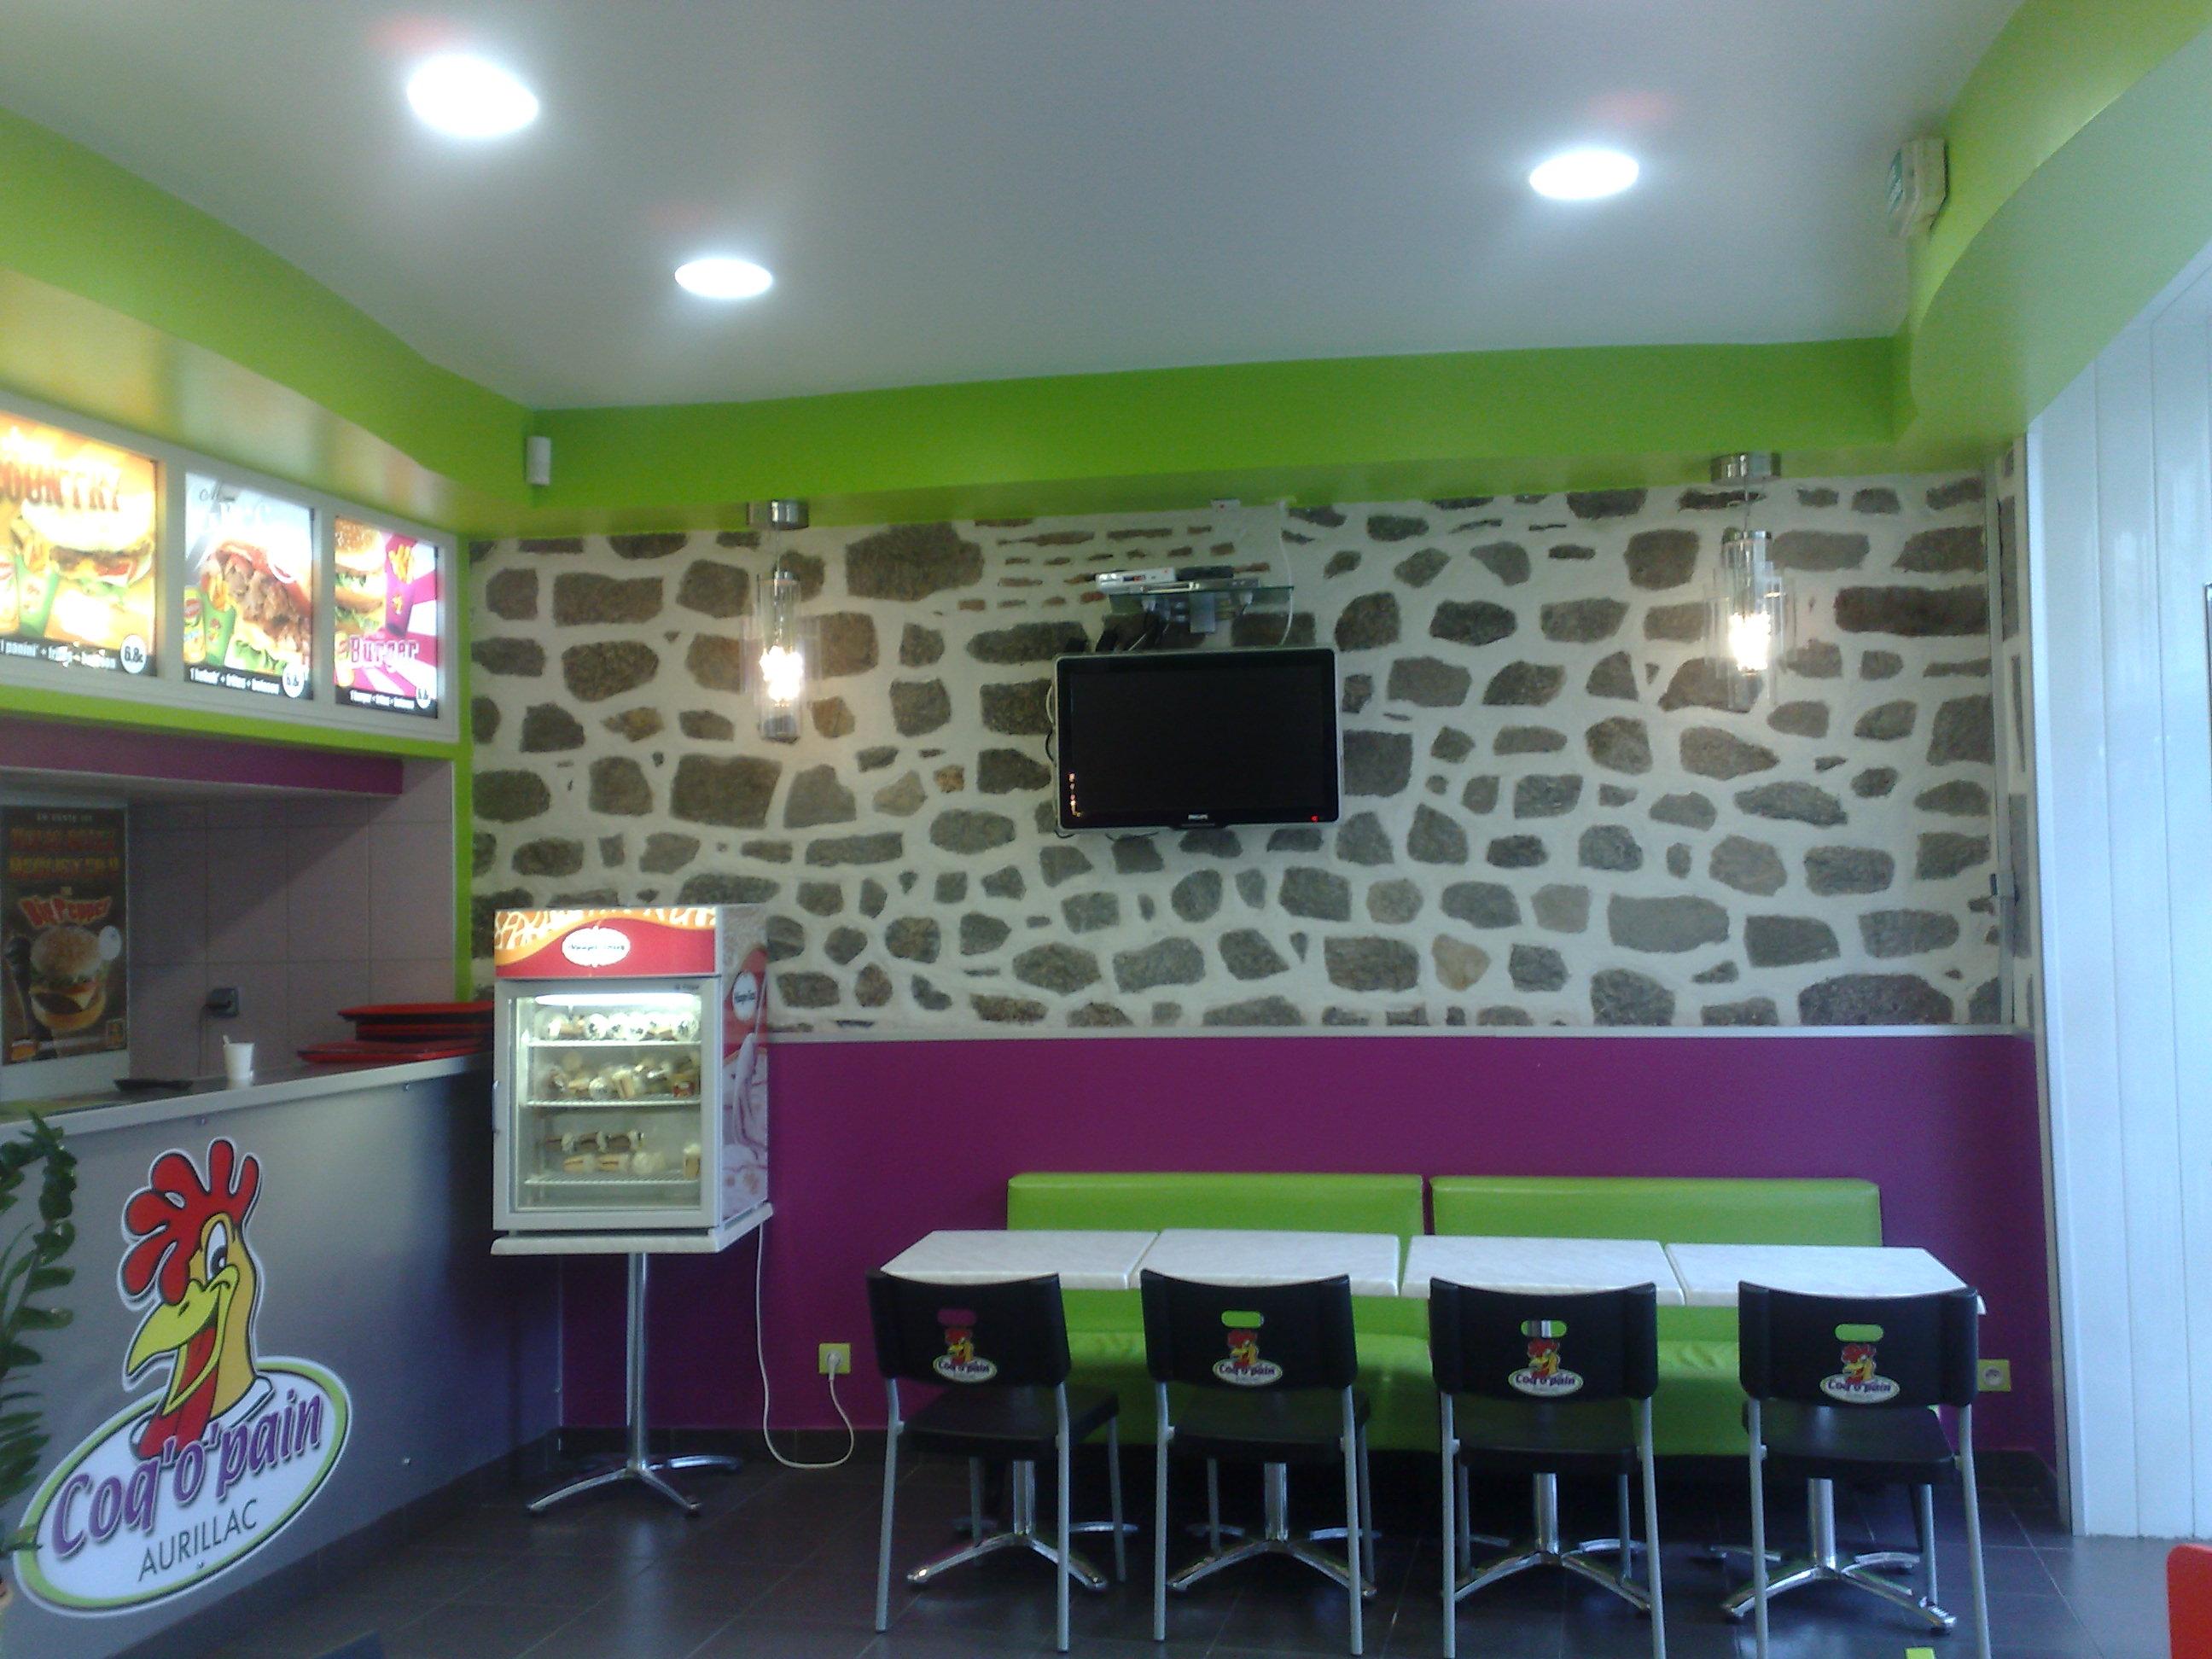 Coq o pain fast food à Aurillac